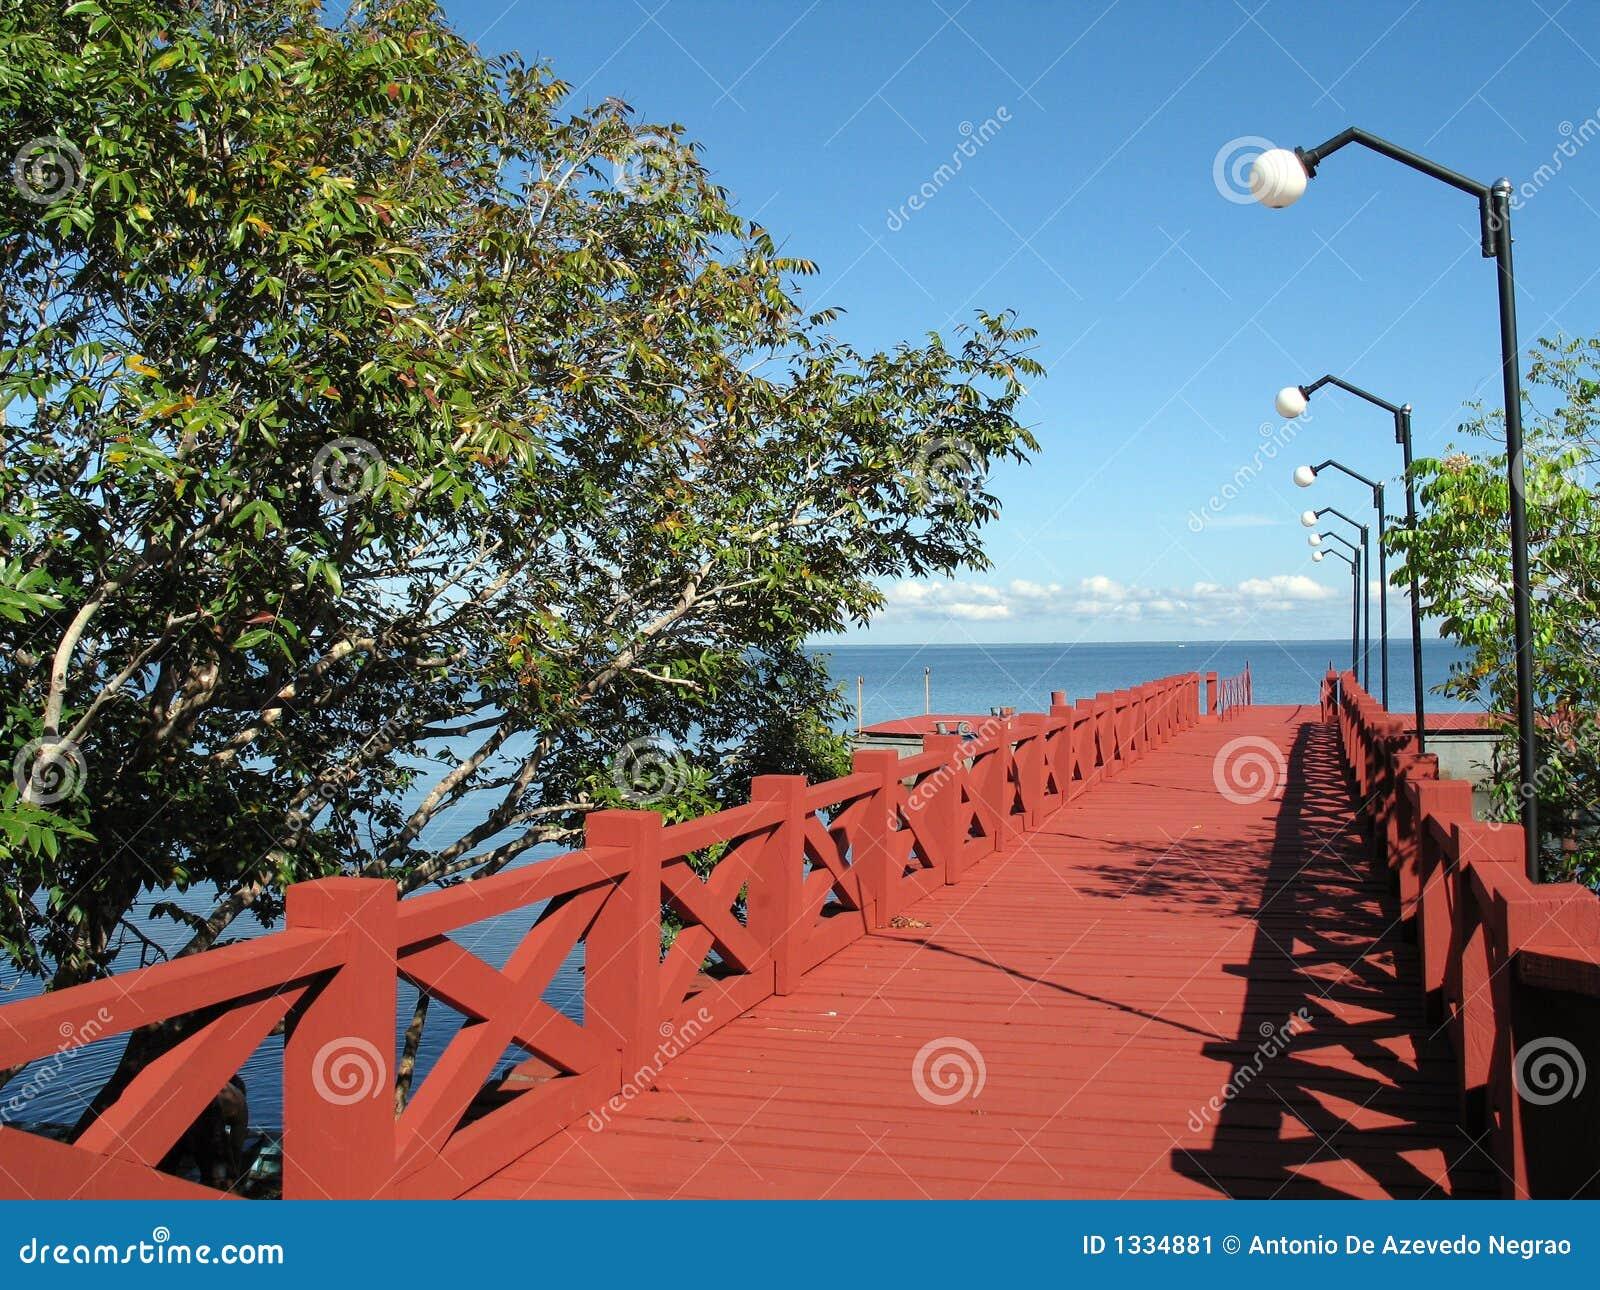 Red pier